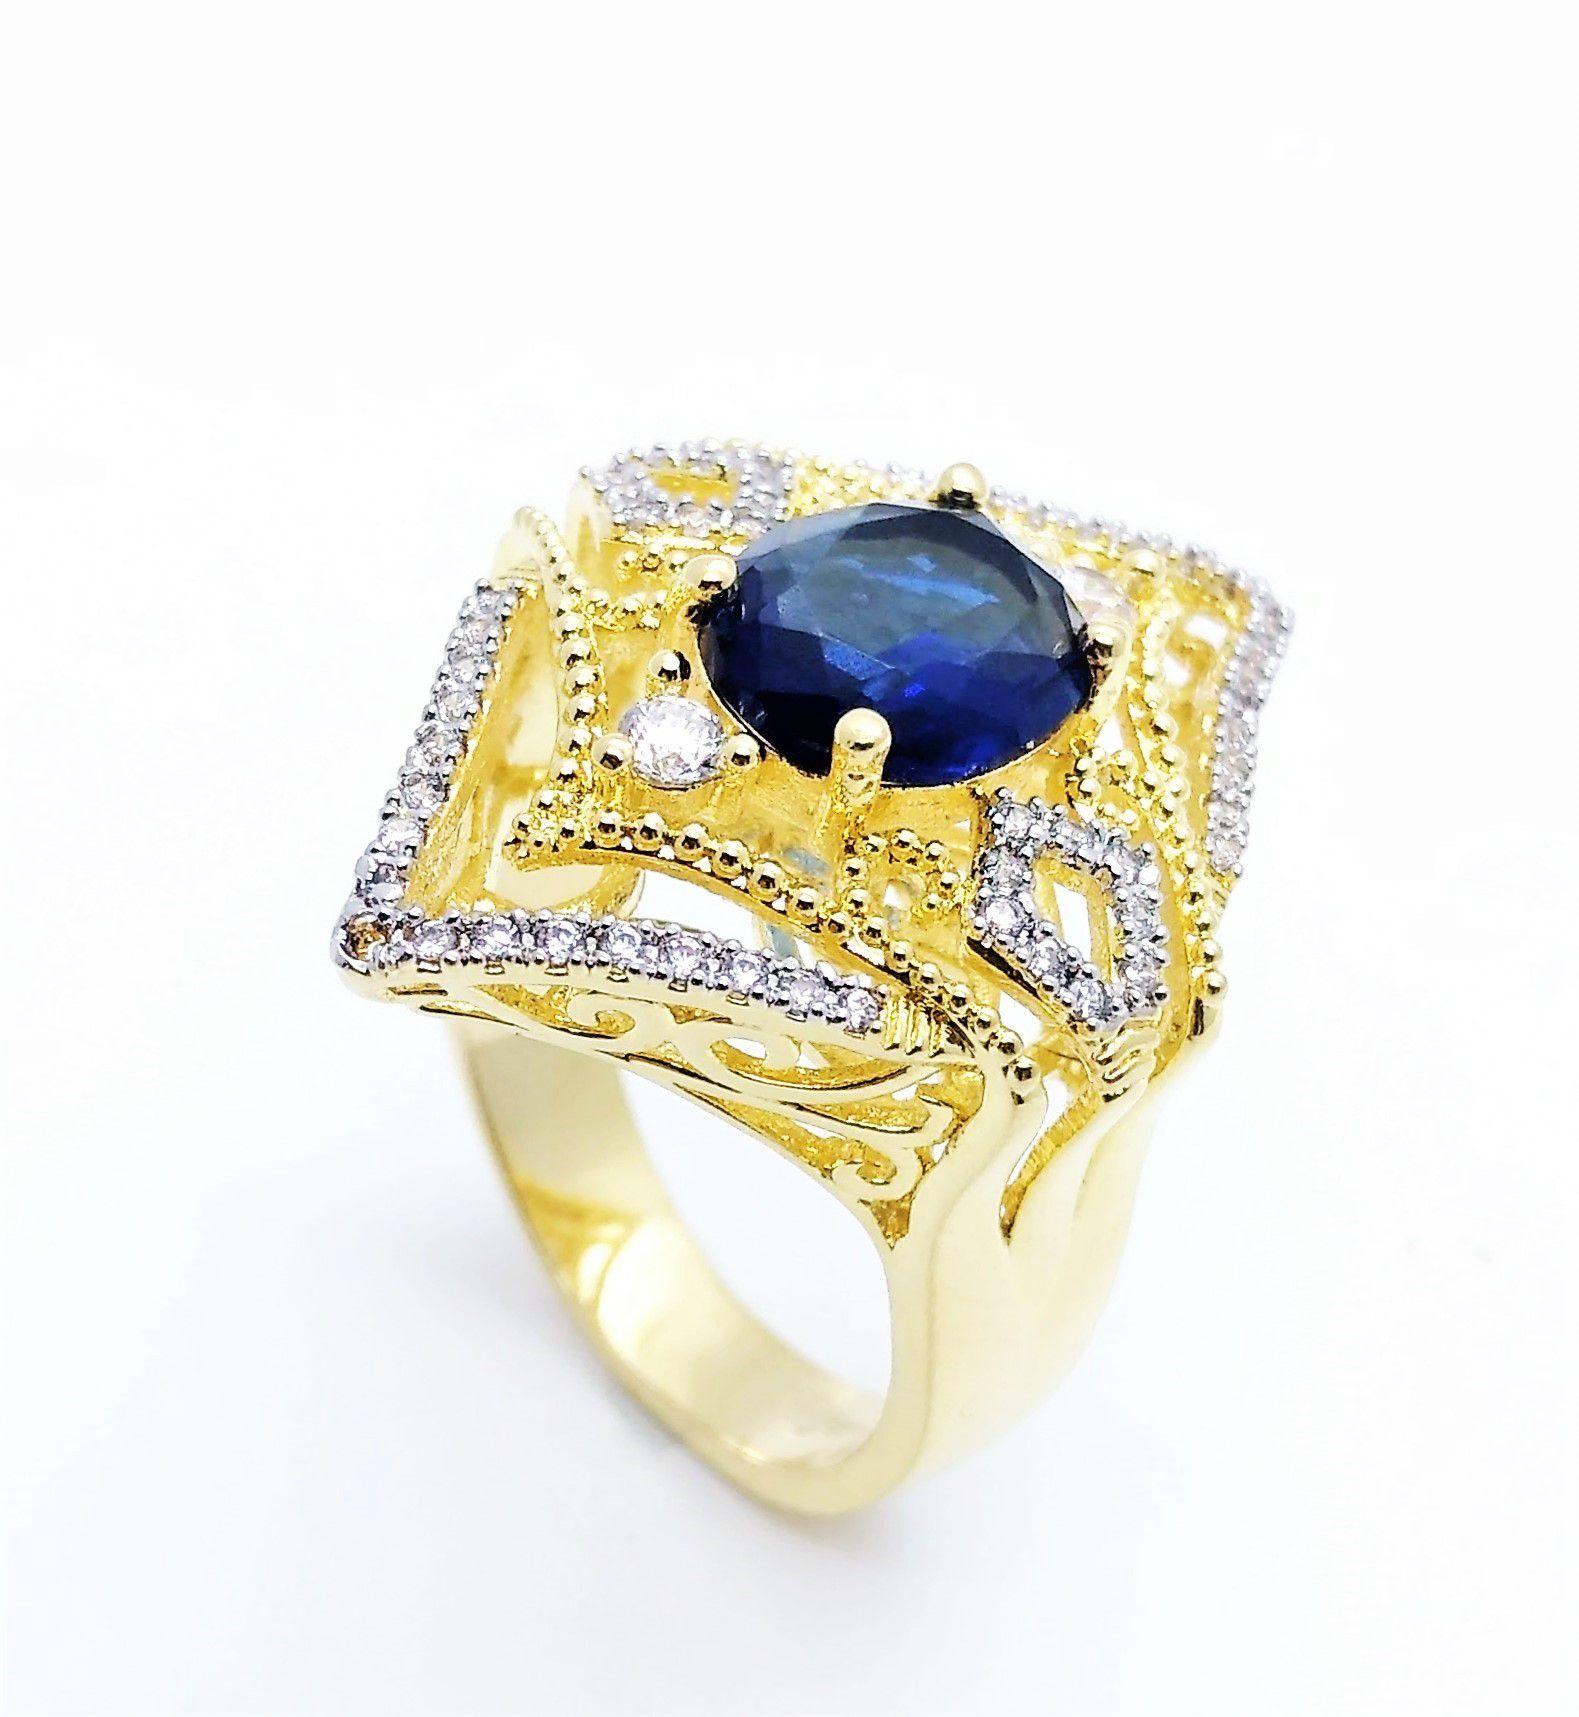 Anel Cristal London Blue E Zzirconias Banho Ouro 18k 3503